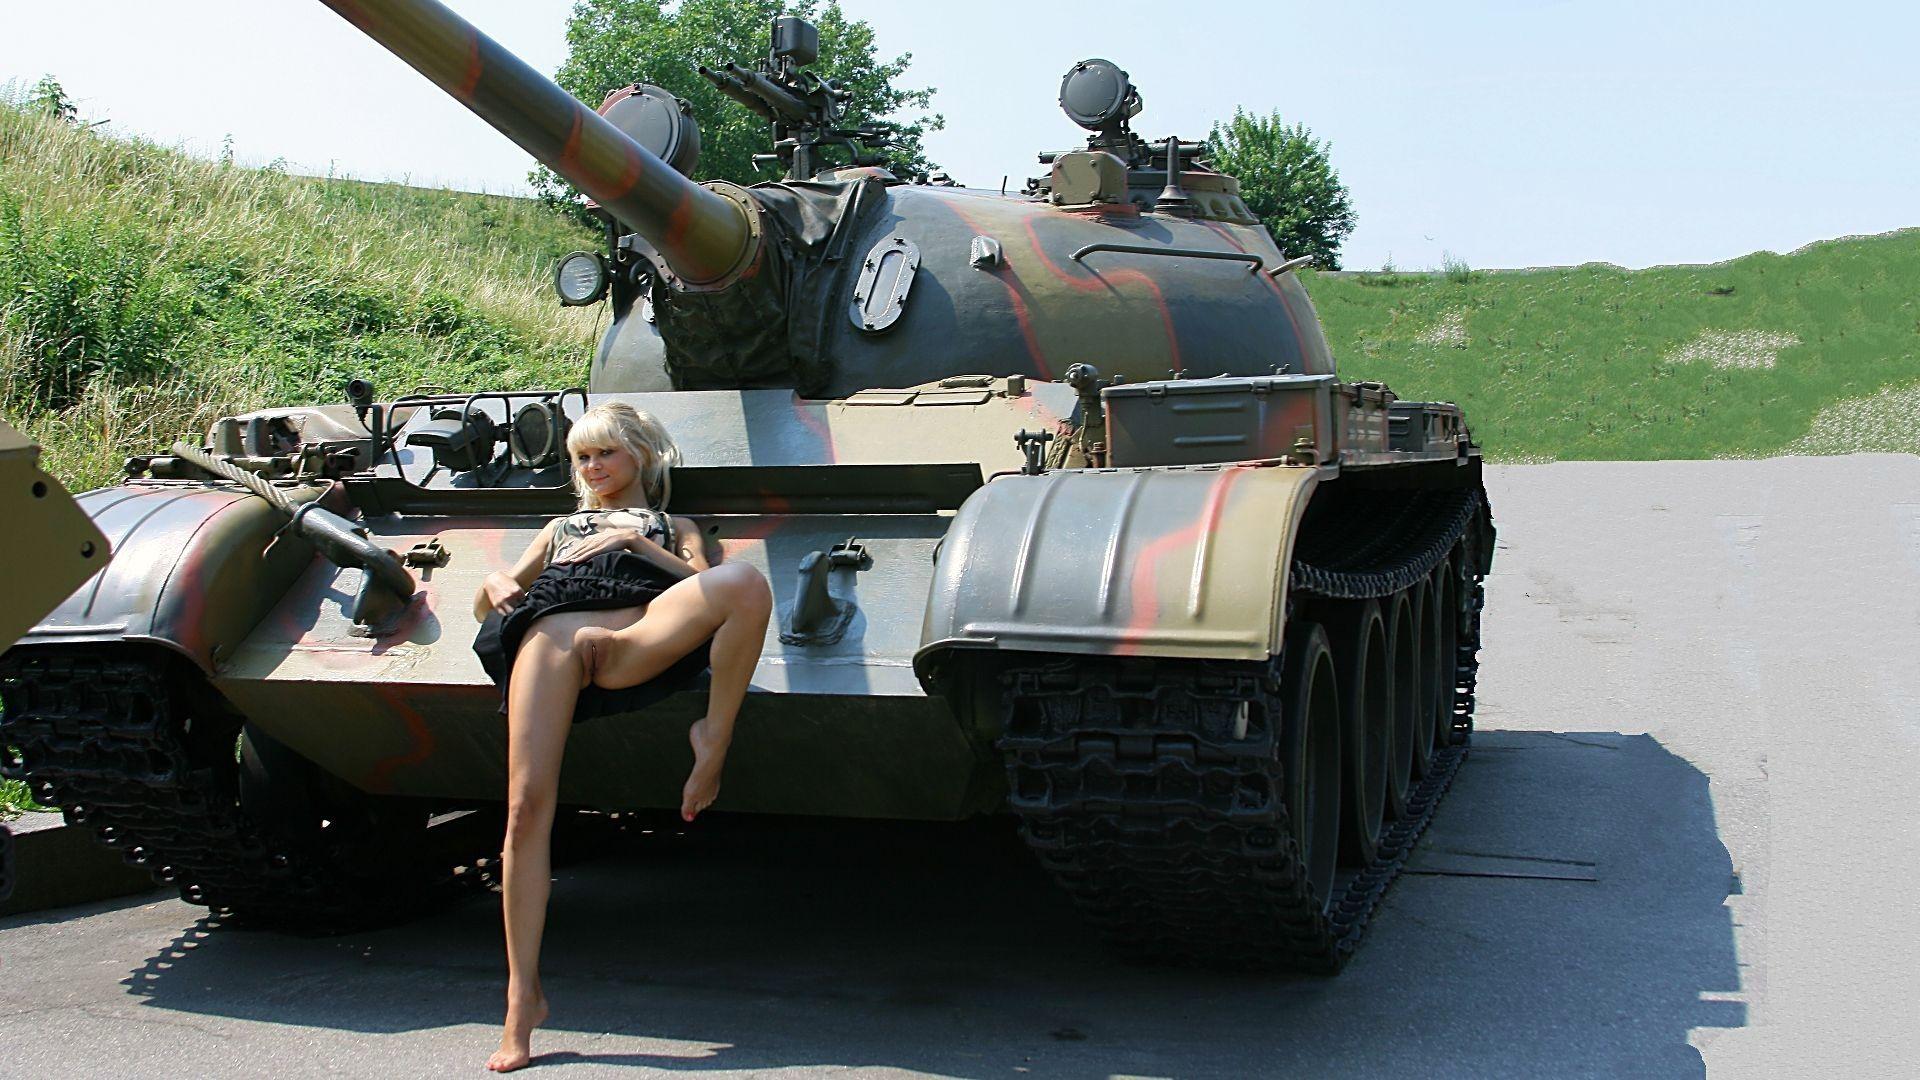 Фото эротика на танке 8 фотография